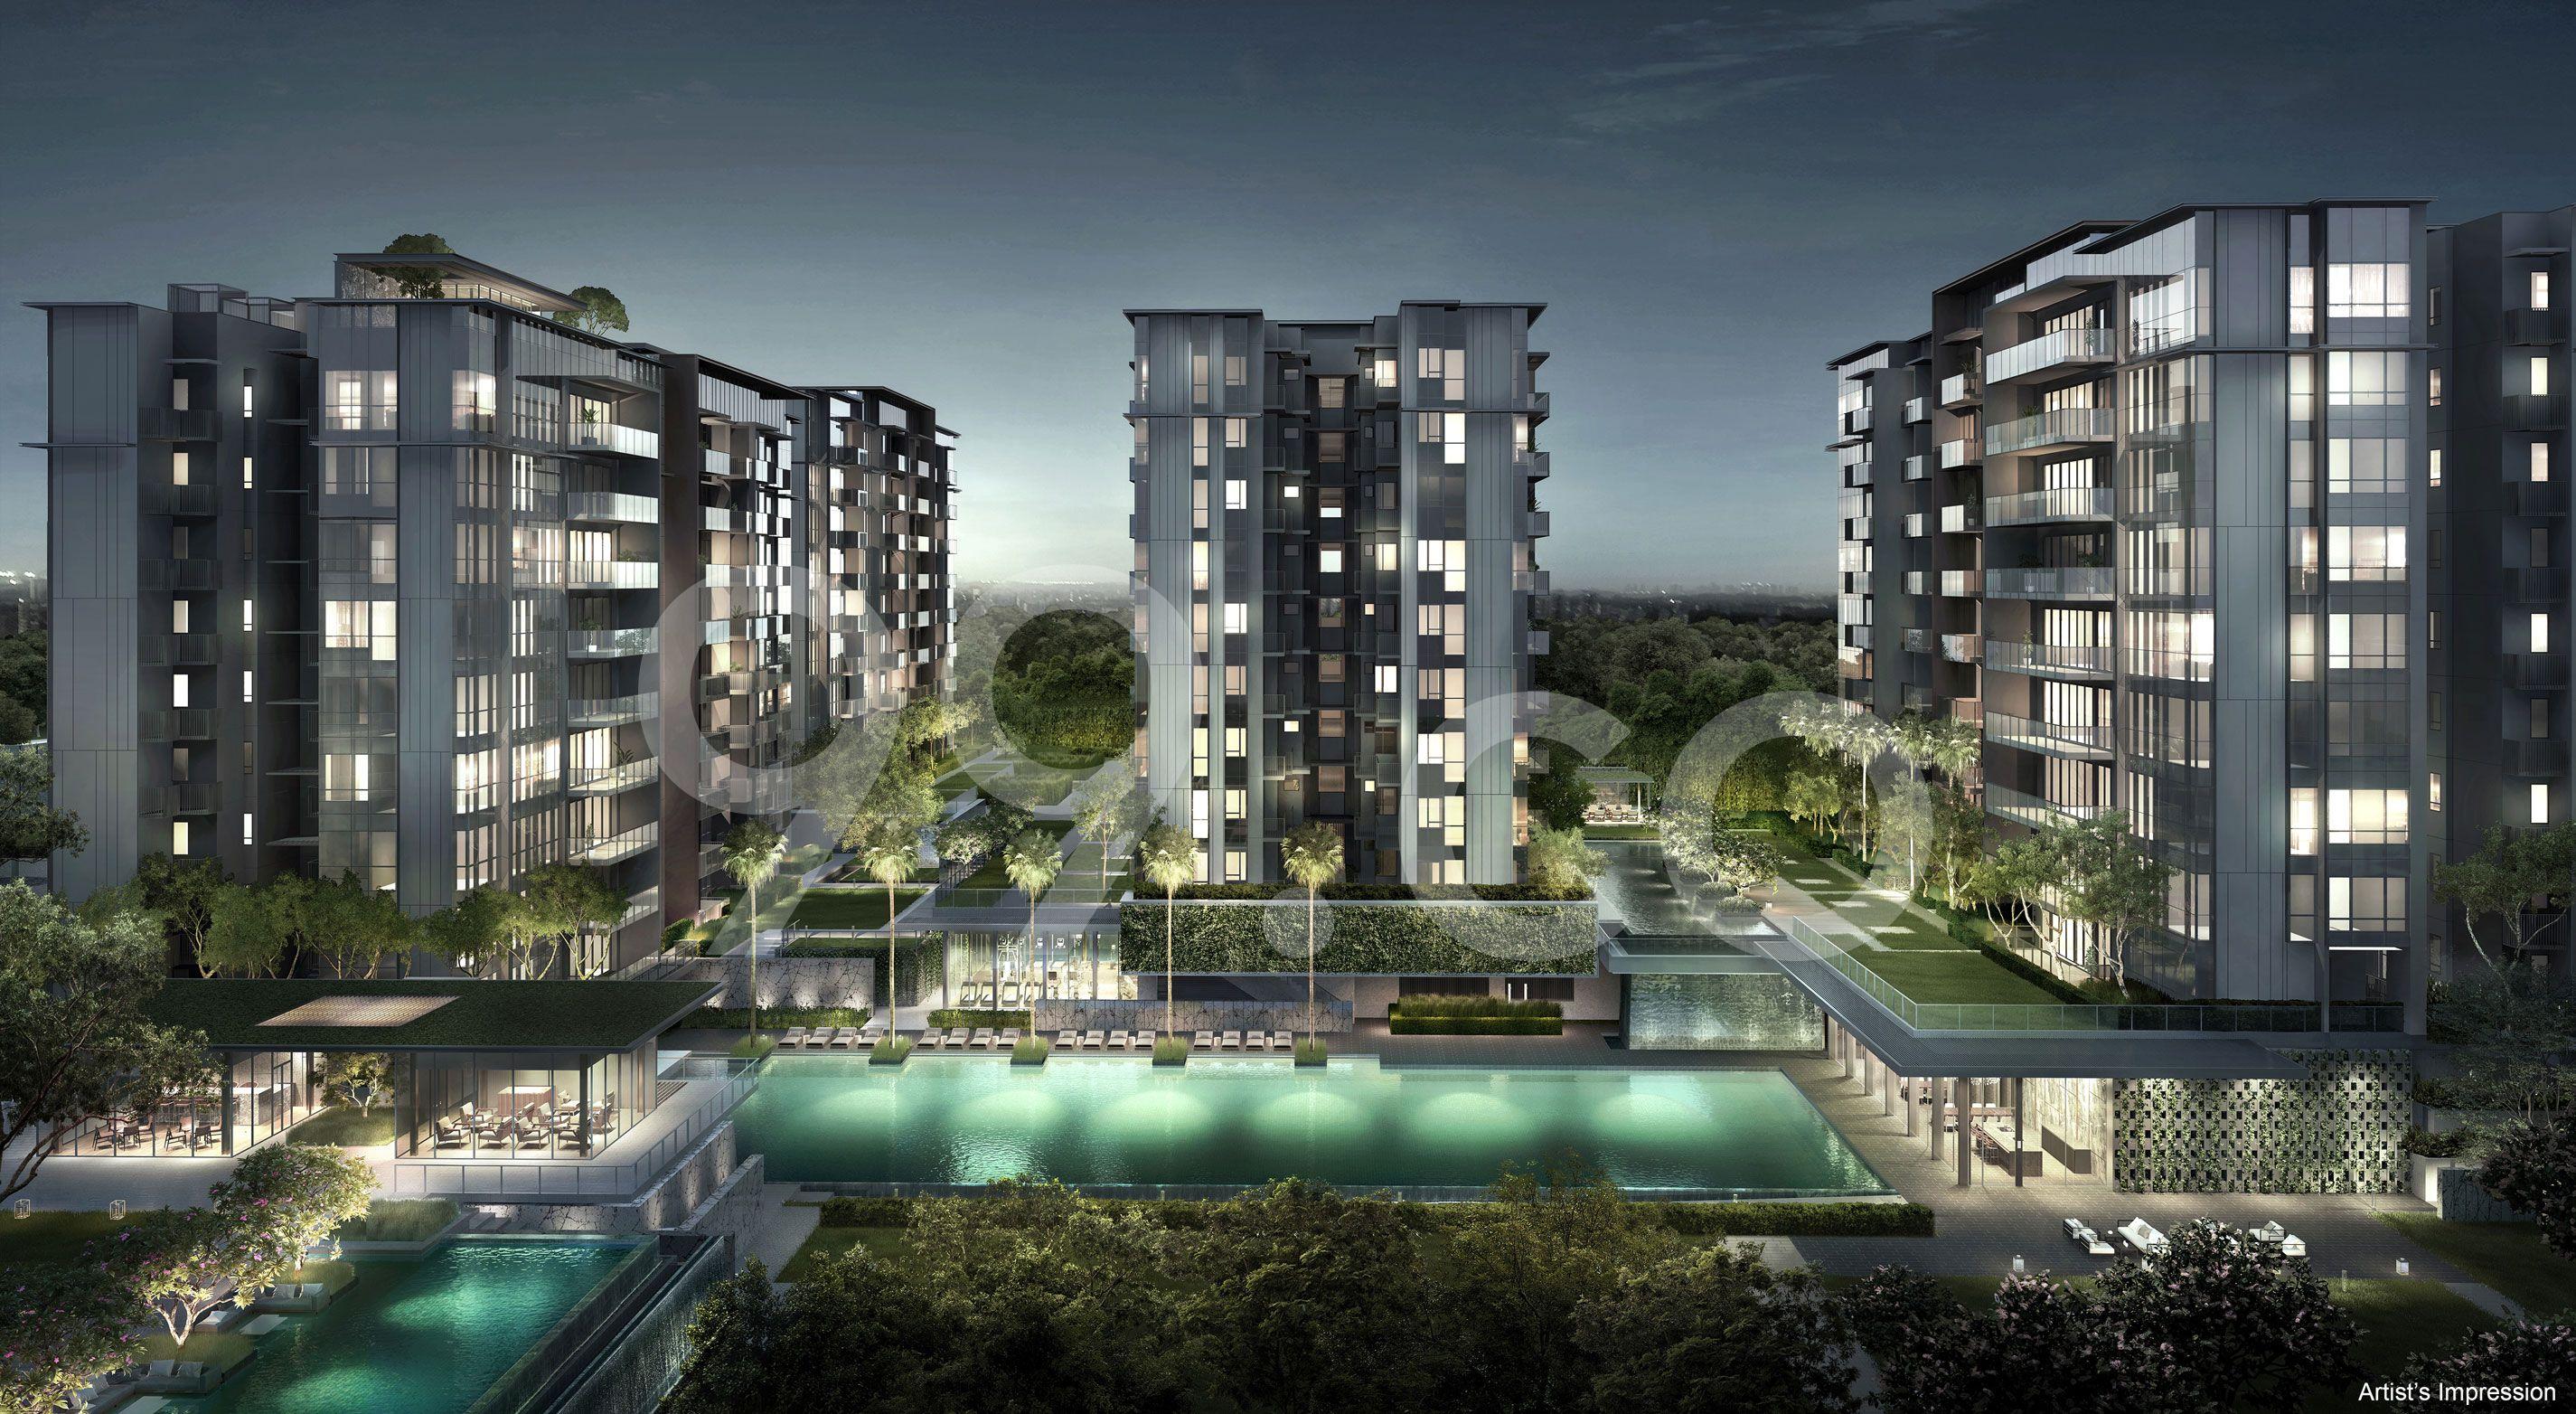 Forett @ Bukit Timah Facade - Night View